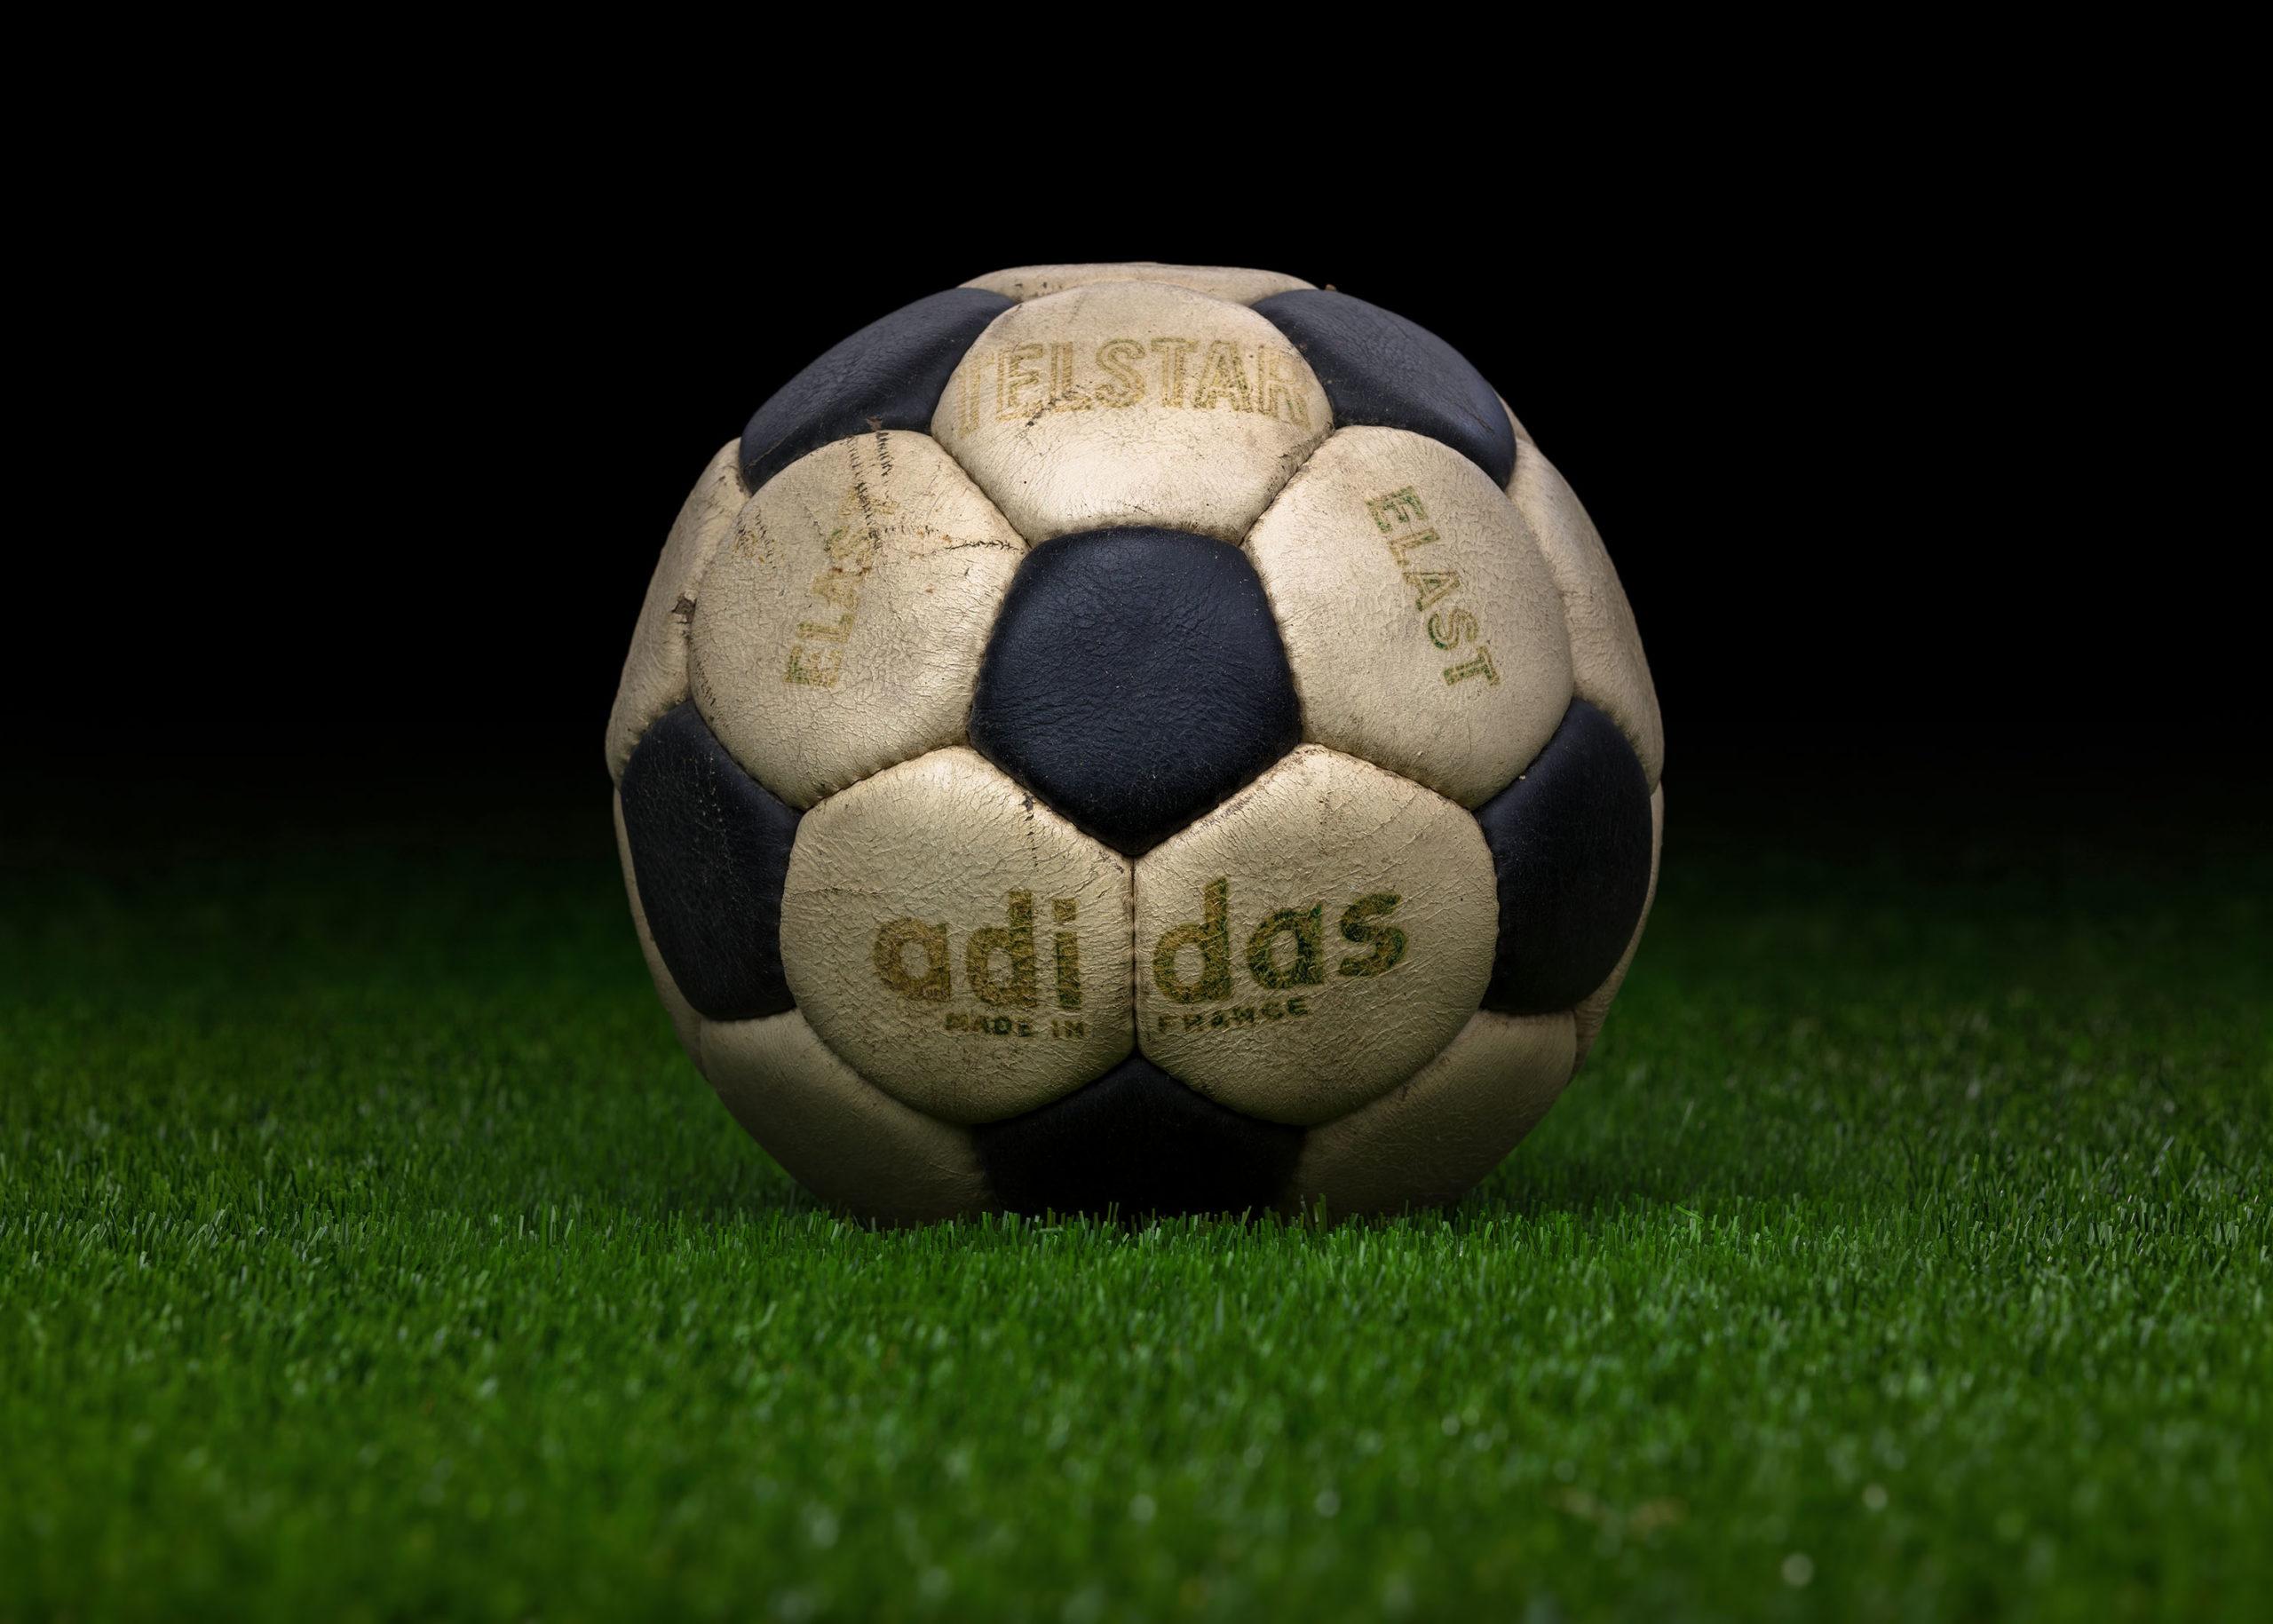 Retour sur un demi-siècle FIFA - adidas Telstar Mexico 1970